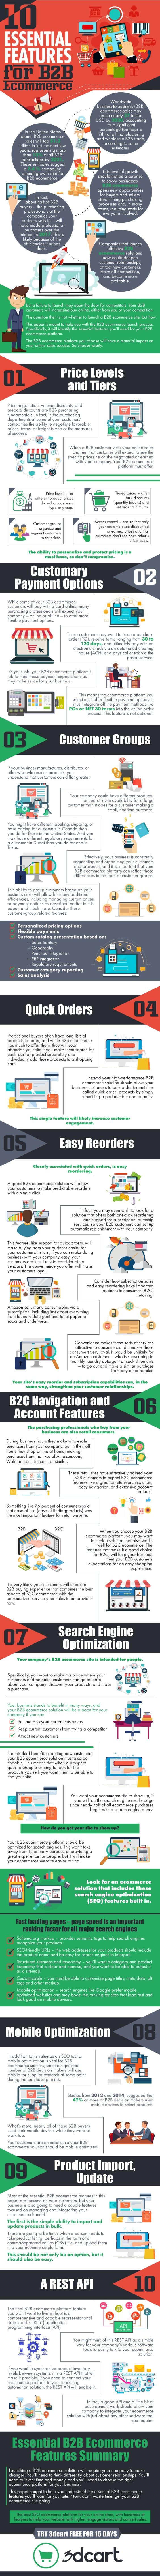 b2b-ecommerce-infographic.jpg